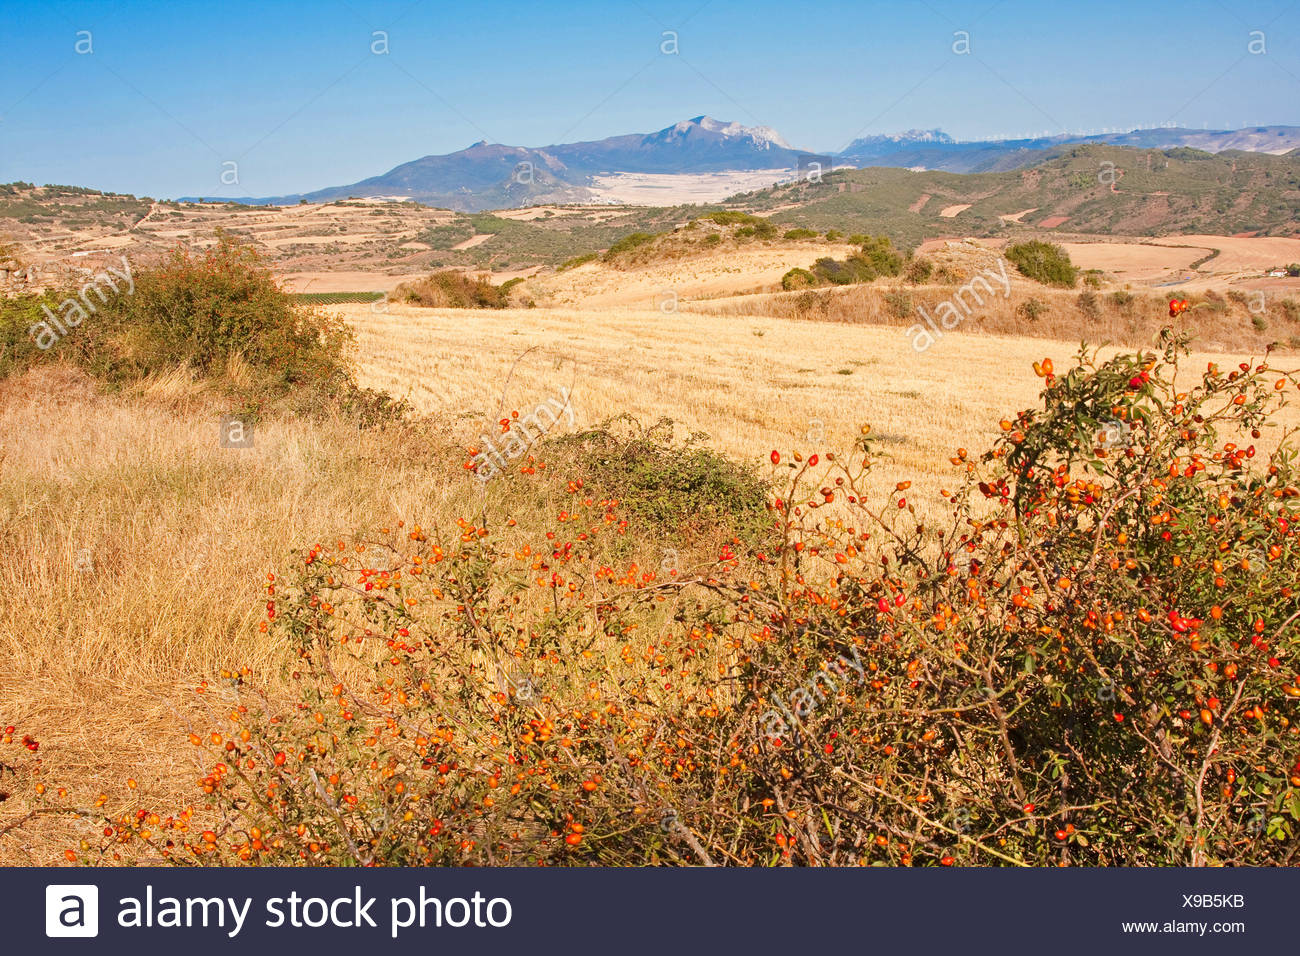 landscape at Camino de Santiago near Estel, Spain, Basque country, Navarra - Stock Image